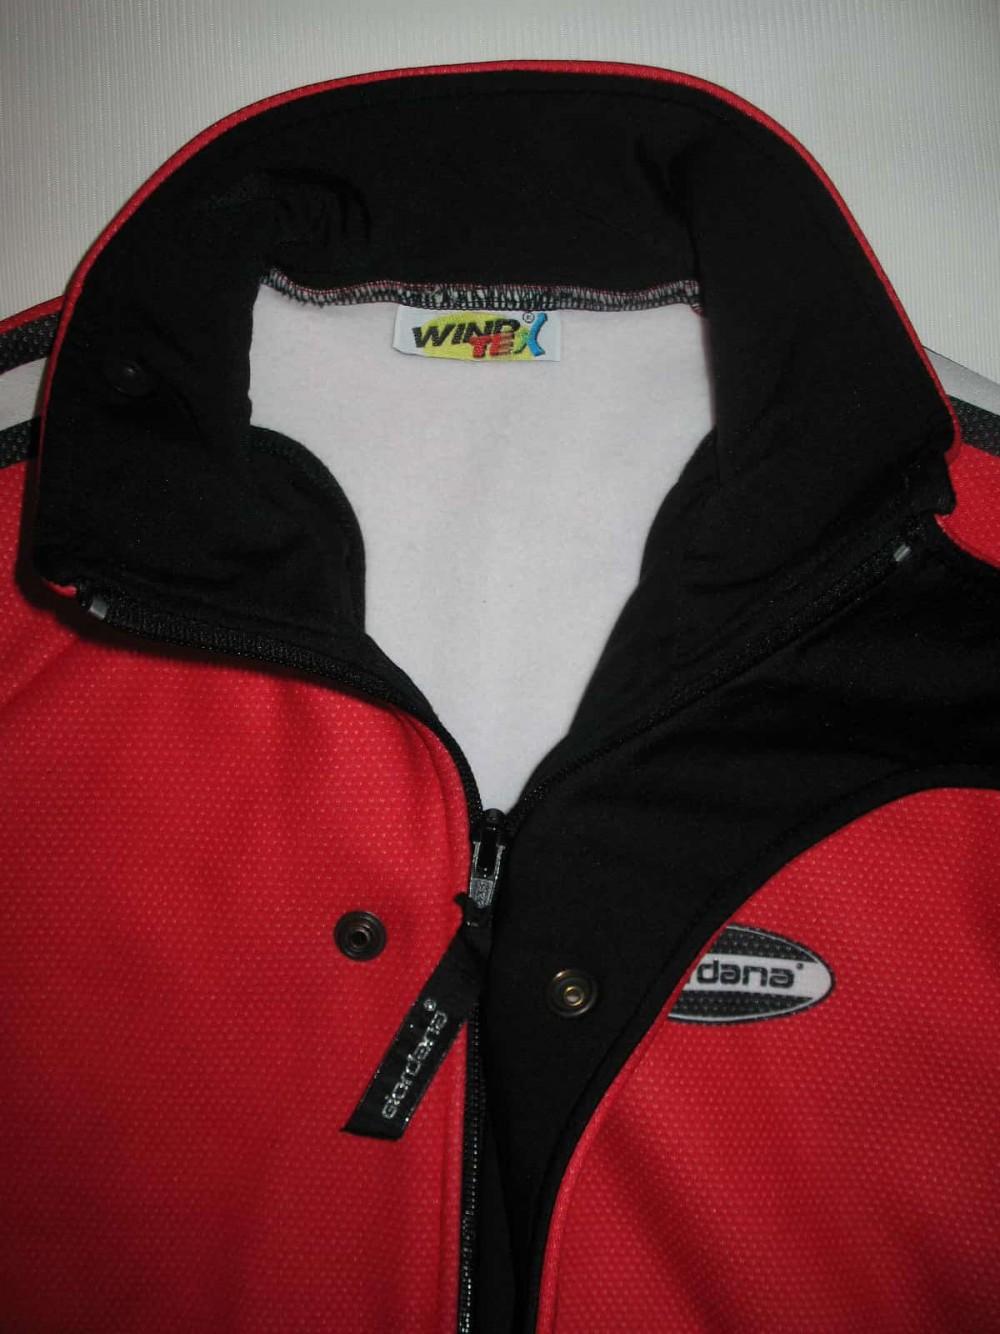 Велокуртка GIORDANA windtex cycling jacket (размер 5-52-XL/L) - 3